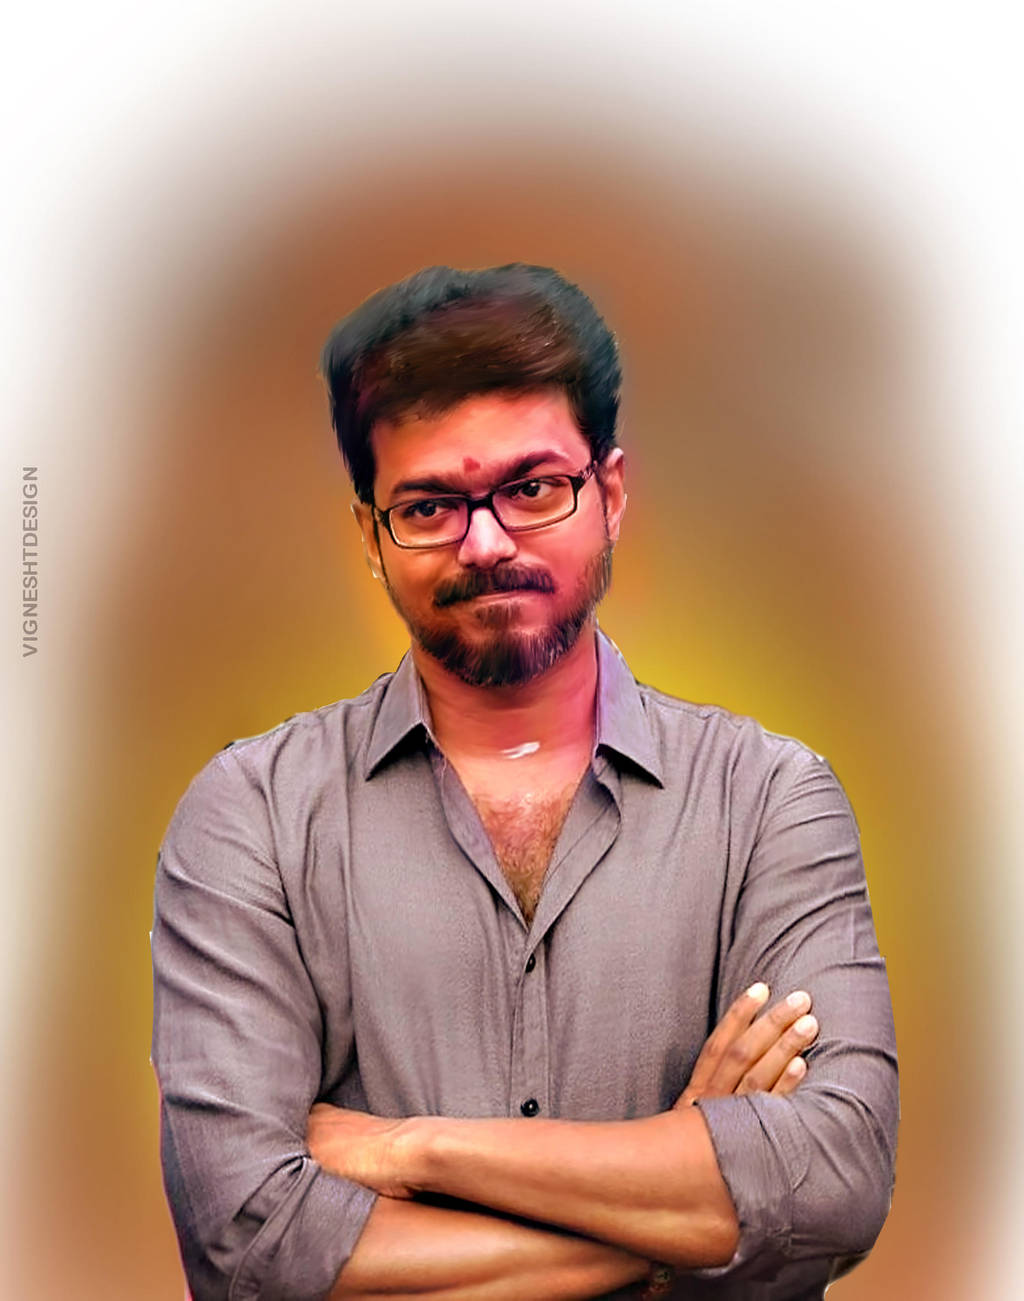 Actor Vijay Digital Painting Uhd By Vigneshtdesign On Deviantart